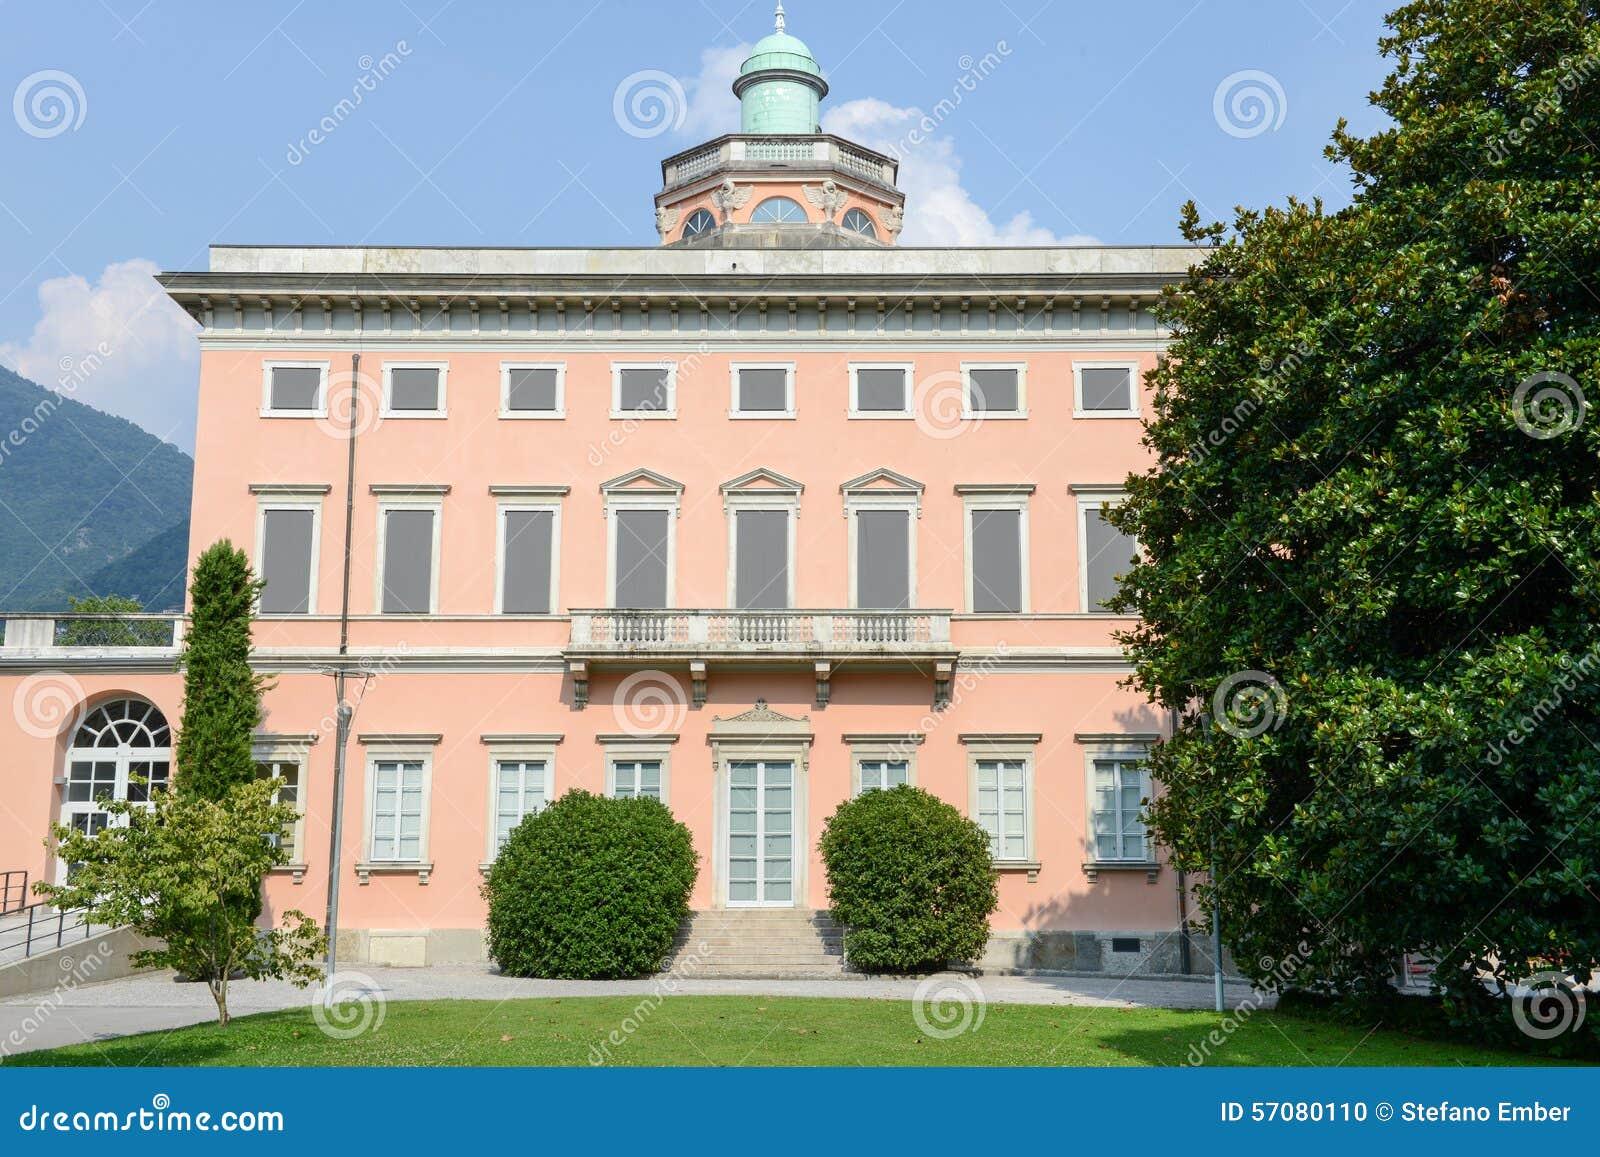 Villa Ciani op botanisch park van Lugano